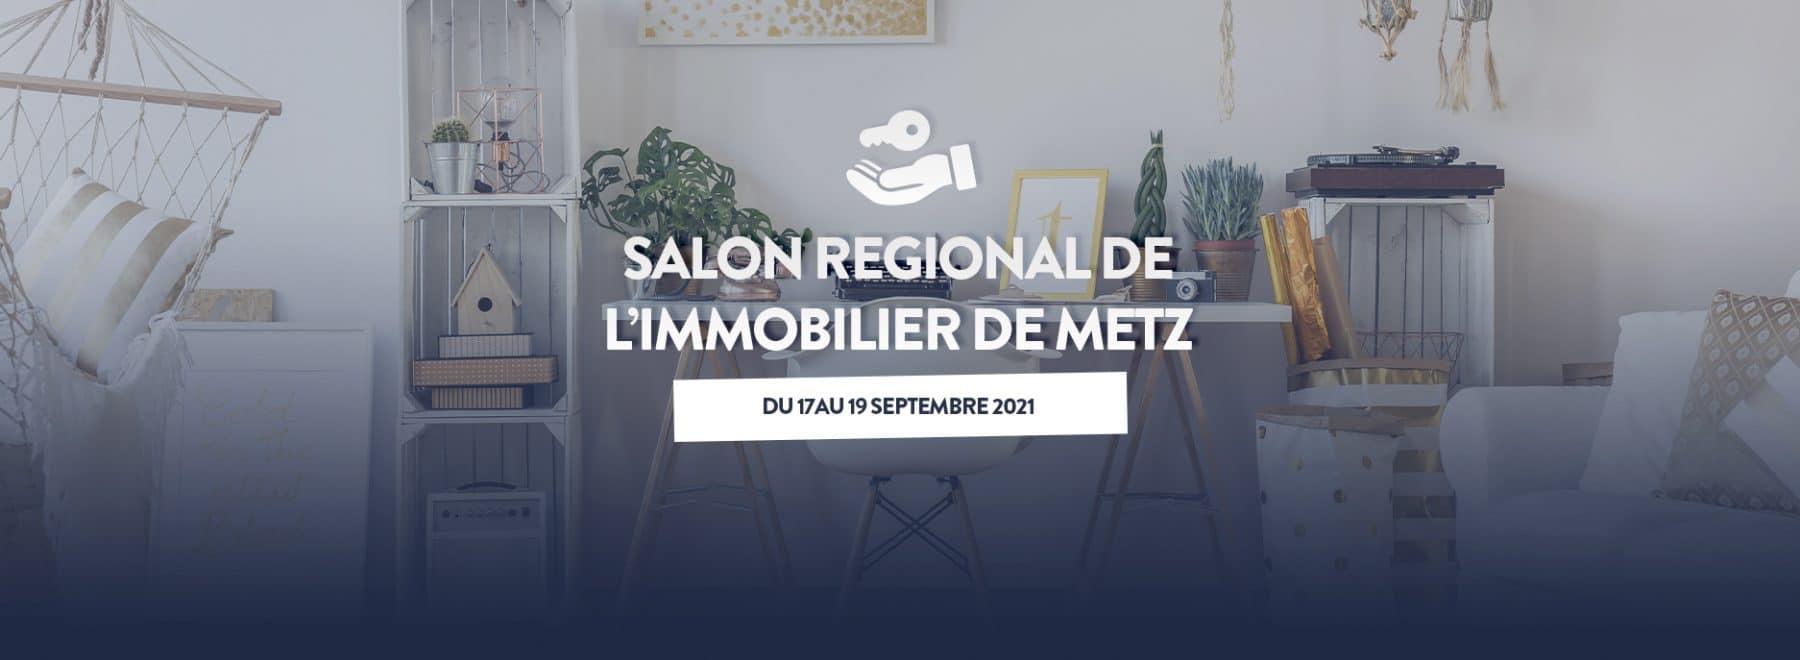 salon regional immobilier metz